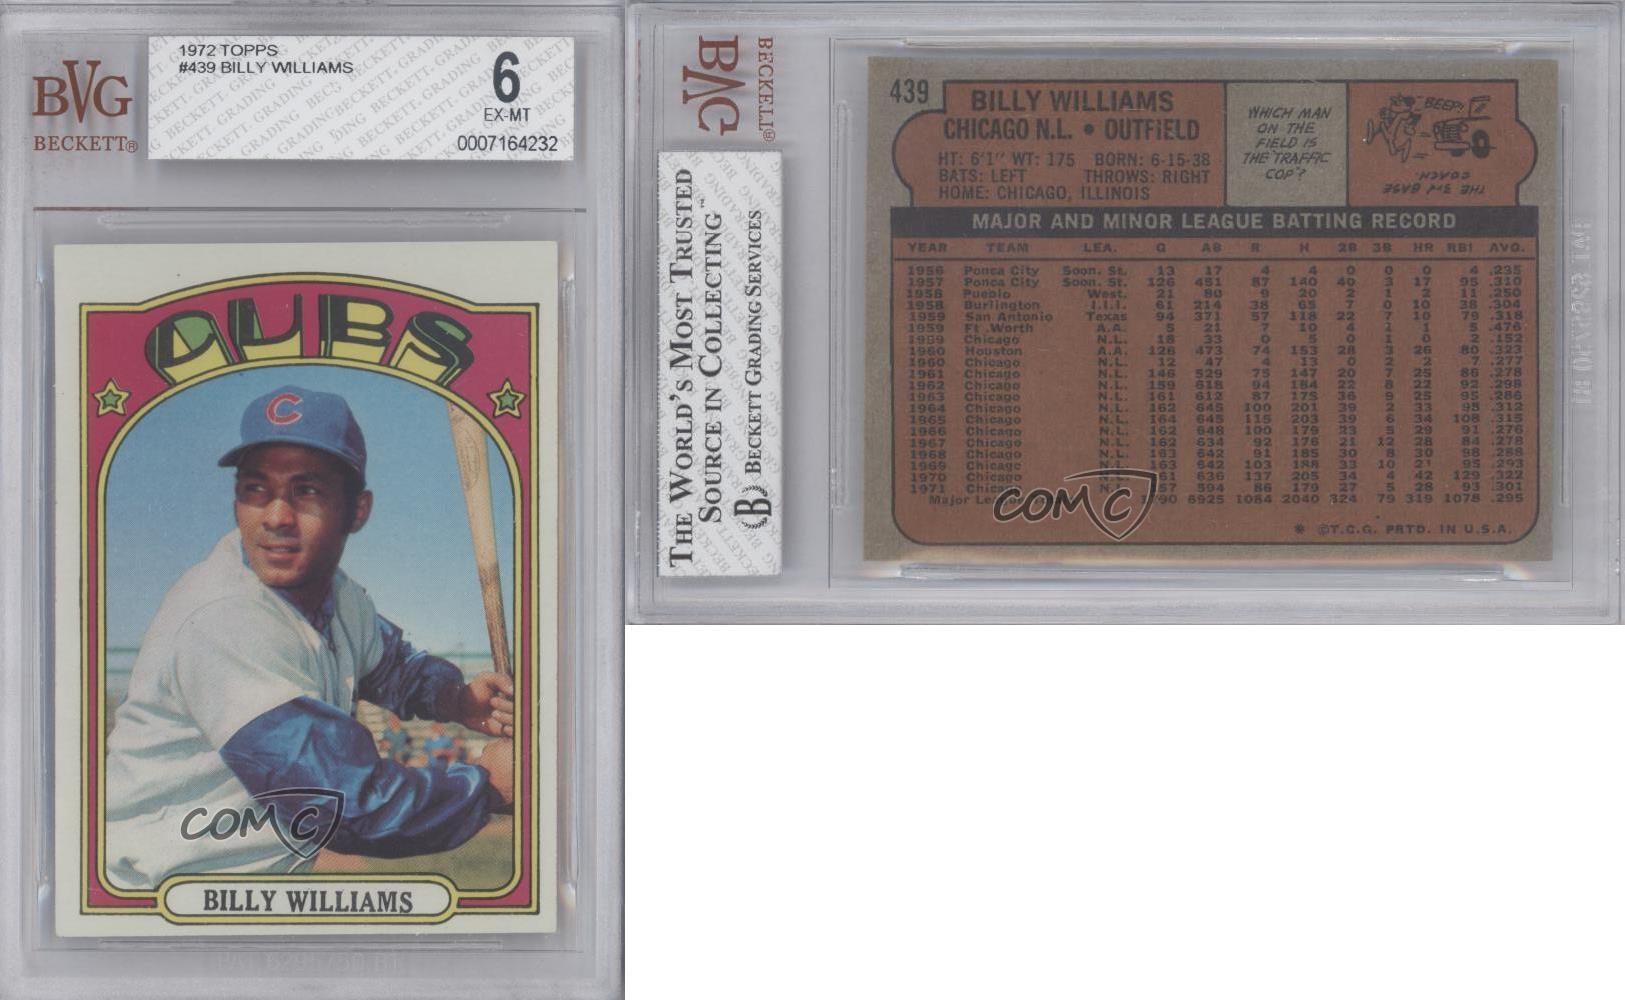 1972 topps 439 billy williams bvg 6 chicago cubs baseball card ebay. Black Bedroom Furniture Sets. Home Design Ideas